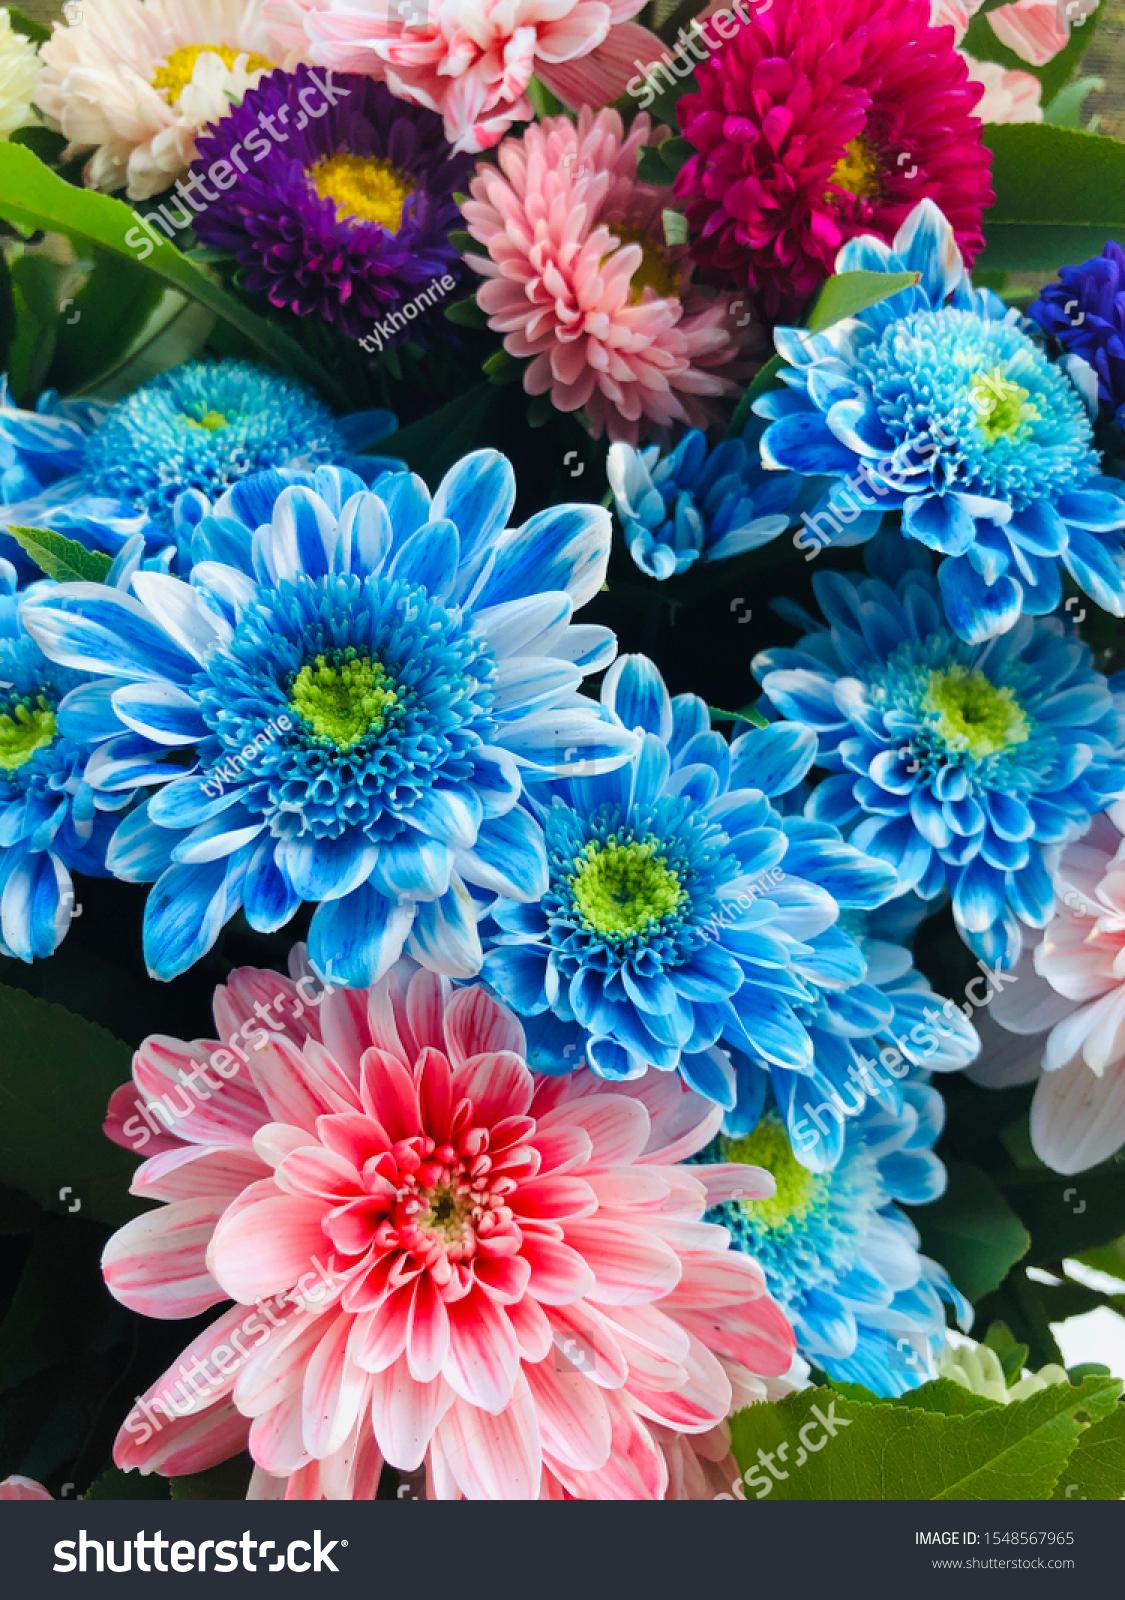 stock-photo-chrysanthemum-aster-blue-red